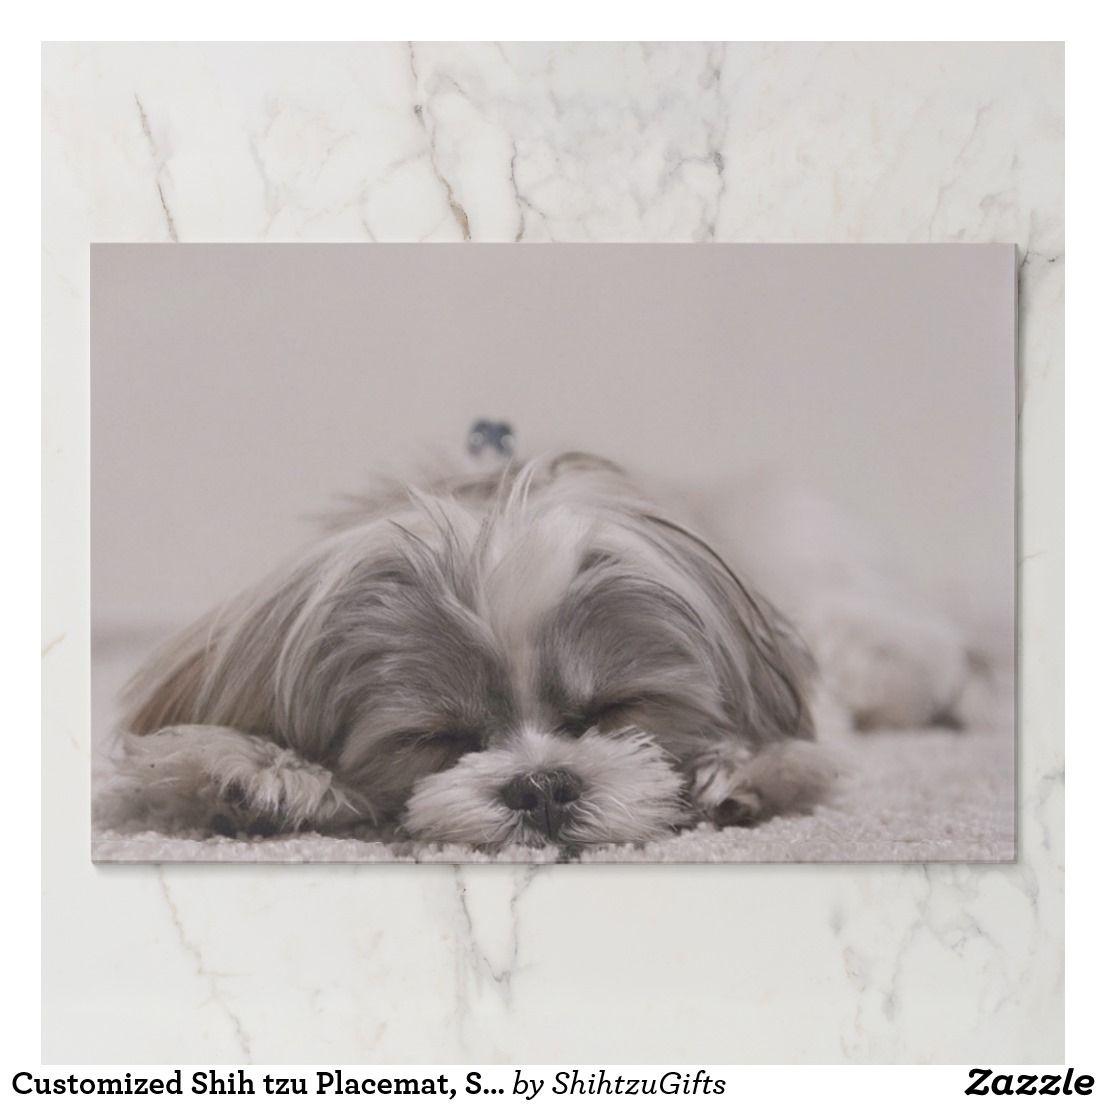 Customized Shih Tzu Placemat Sleeping Dog Paper Placemat Zazzle